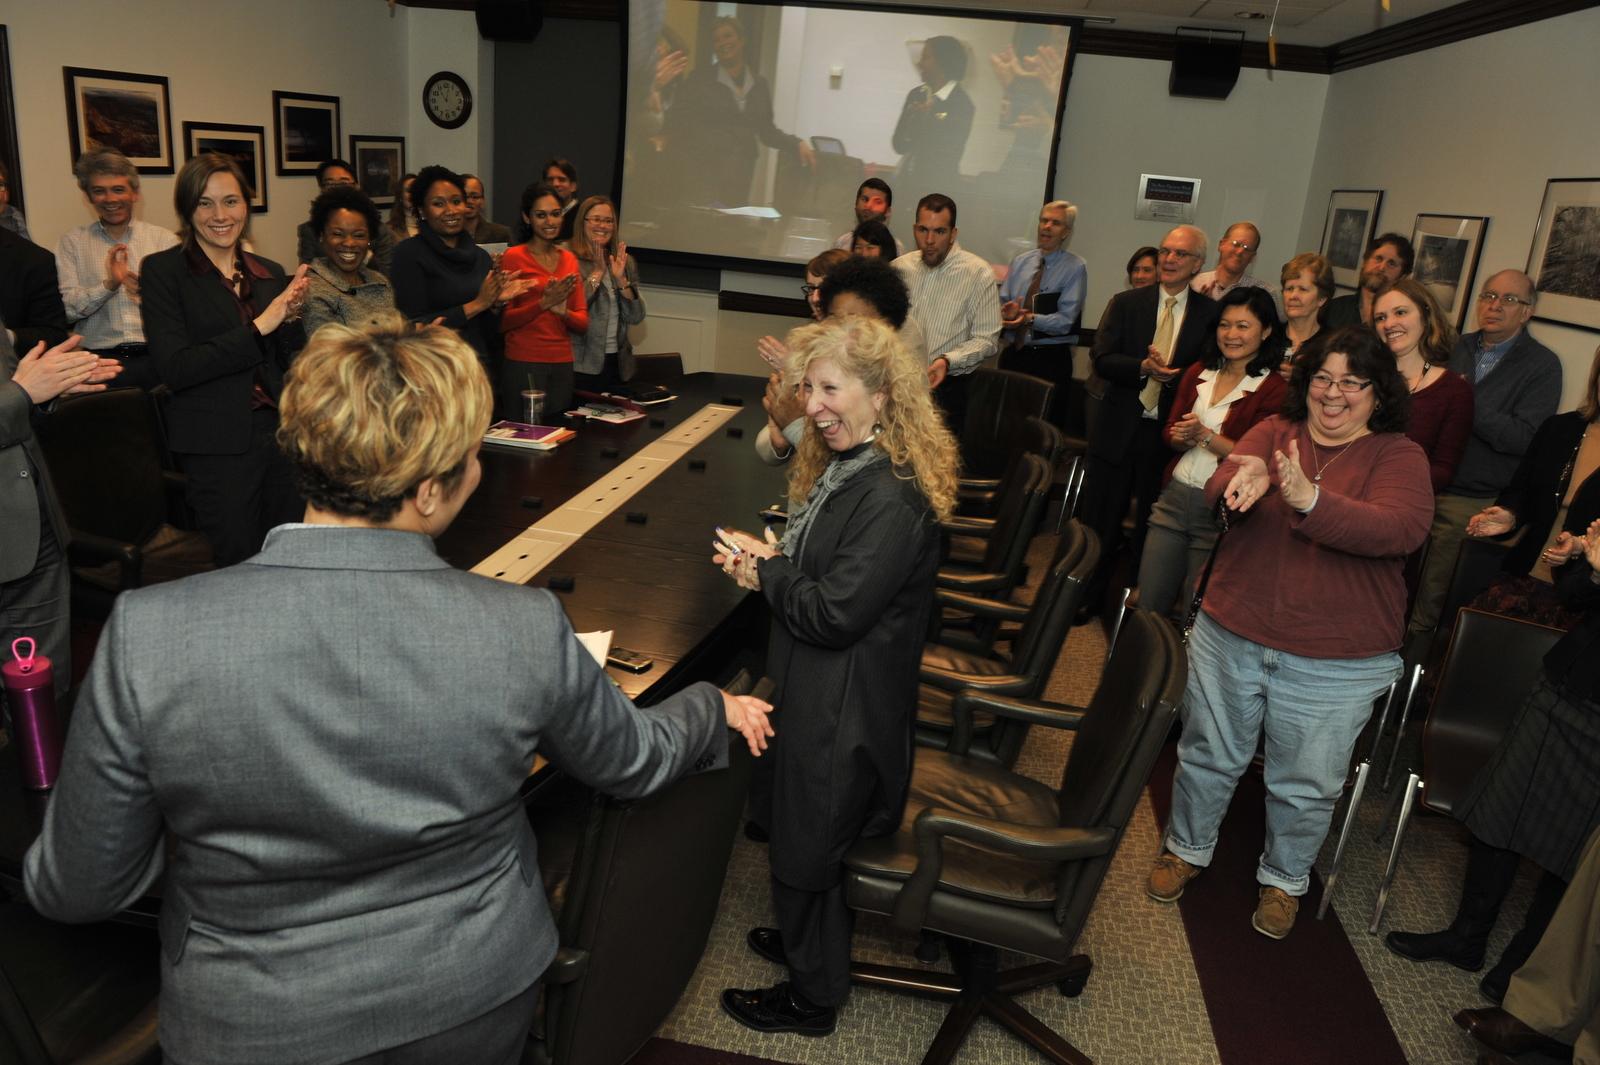 Office of the Administrator - Lisa Jackson's Farewell Tour [412-APD-1115-2013-02-07_FarewellTour_181.JPG]